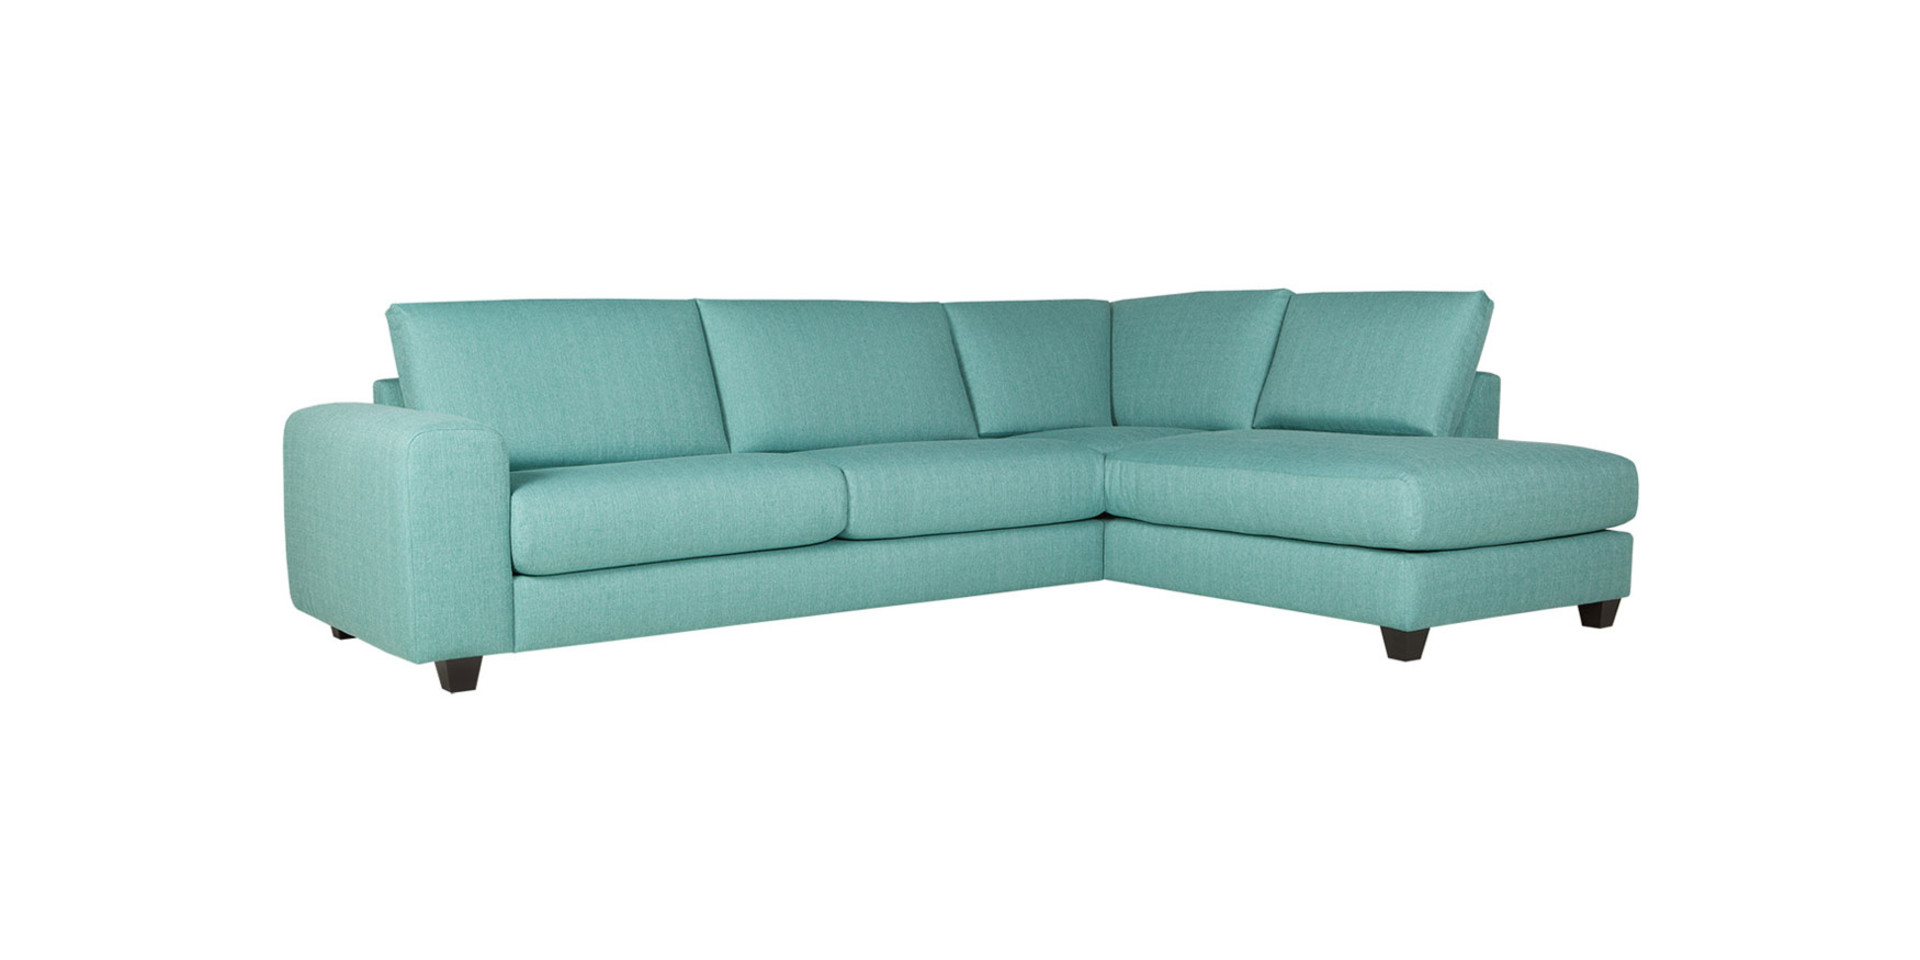 sits-ida-angle-set4_cedros6_turquoise_2